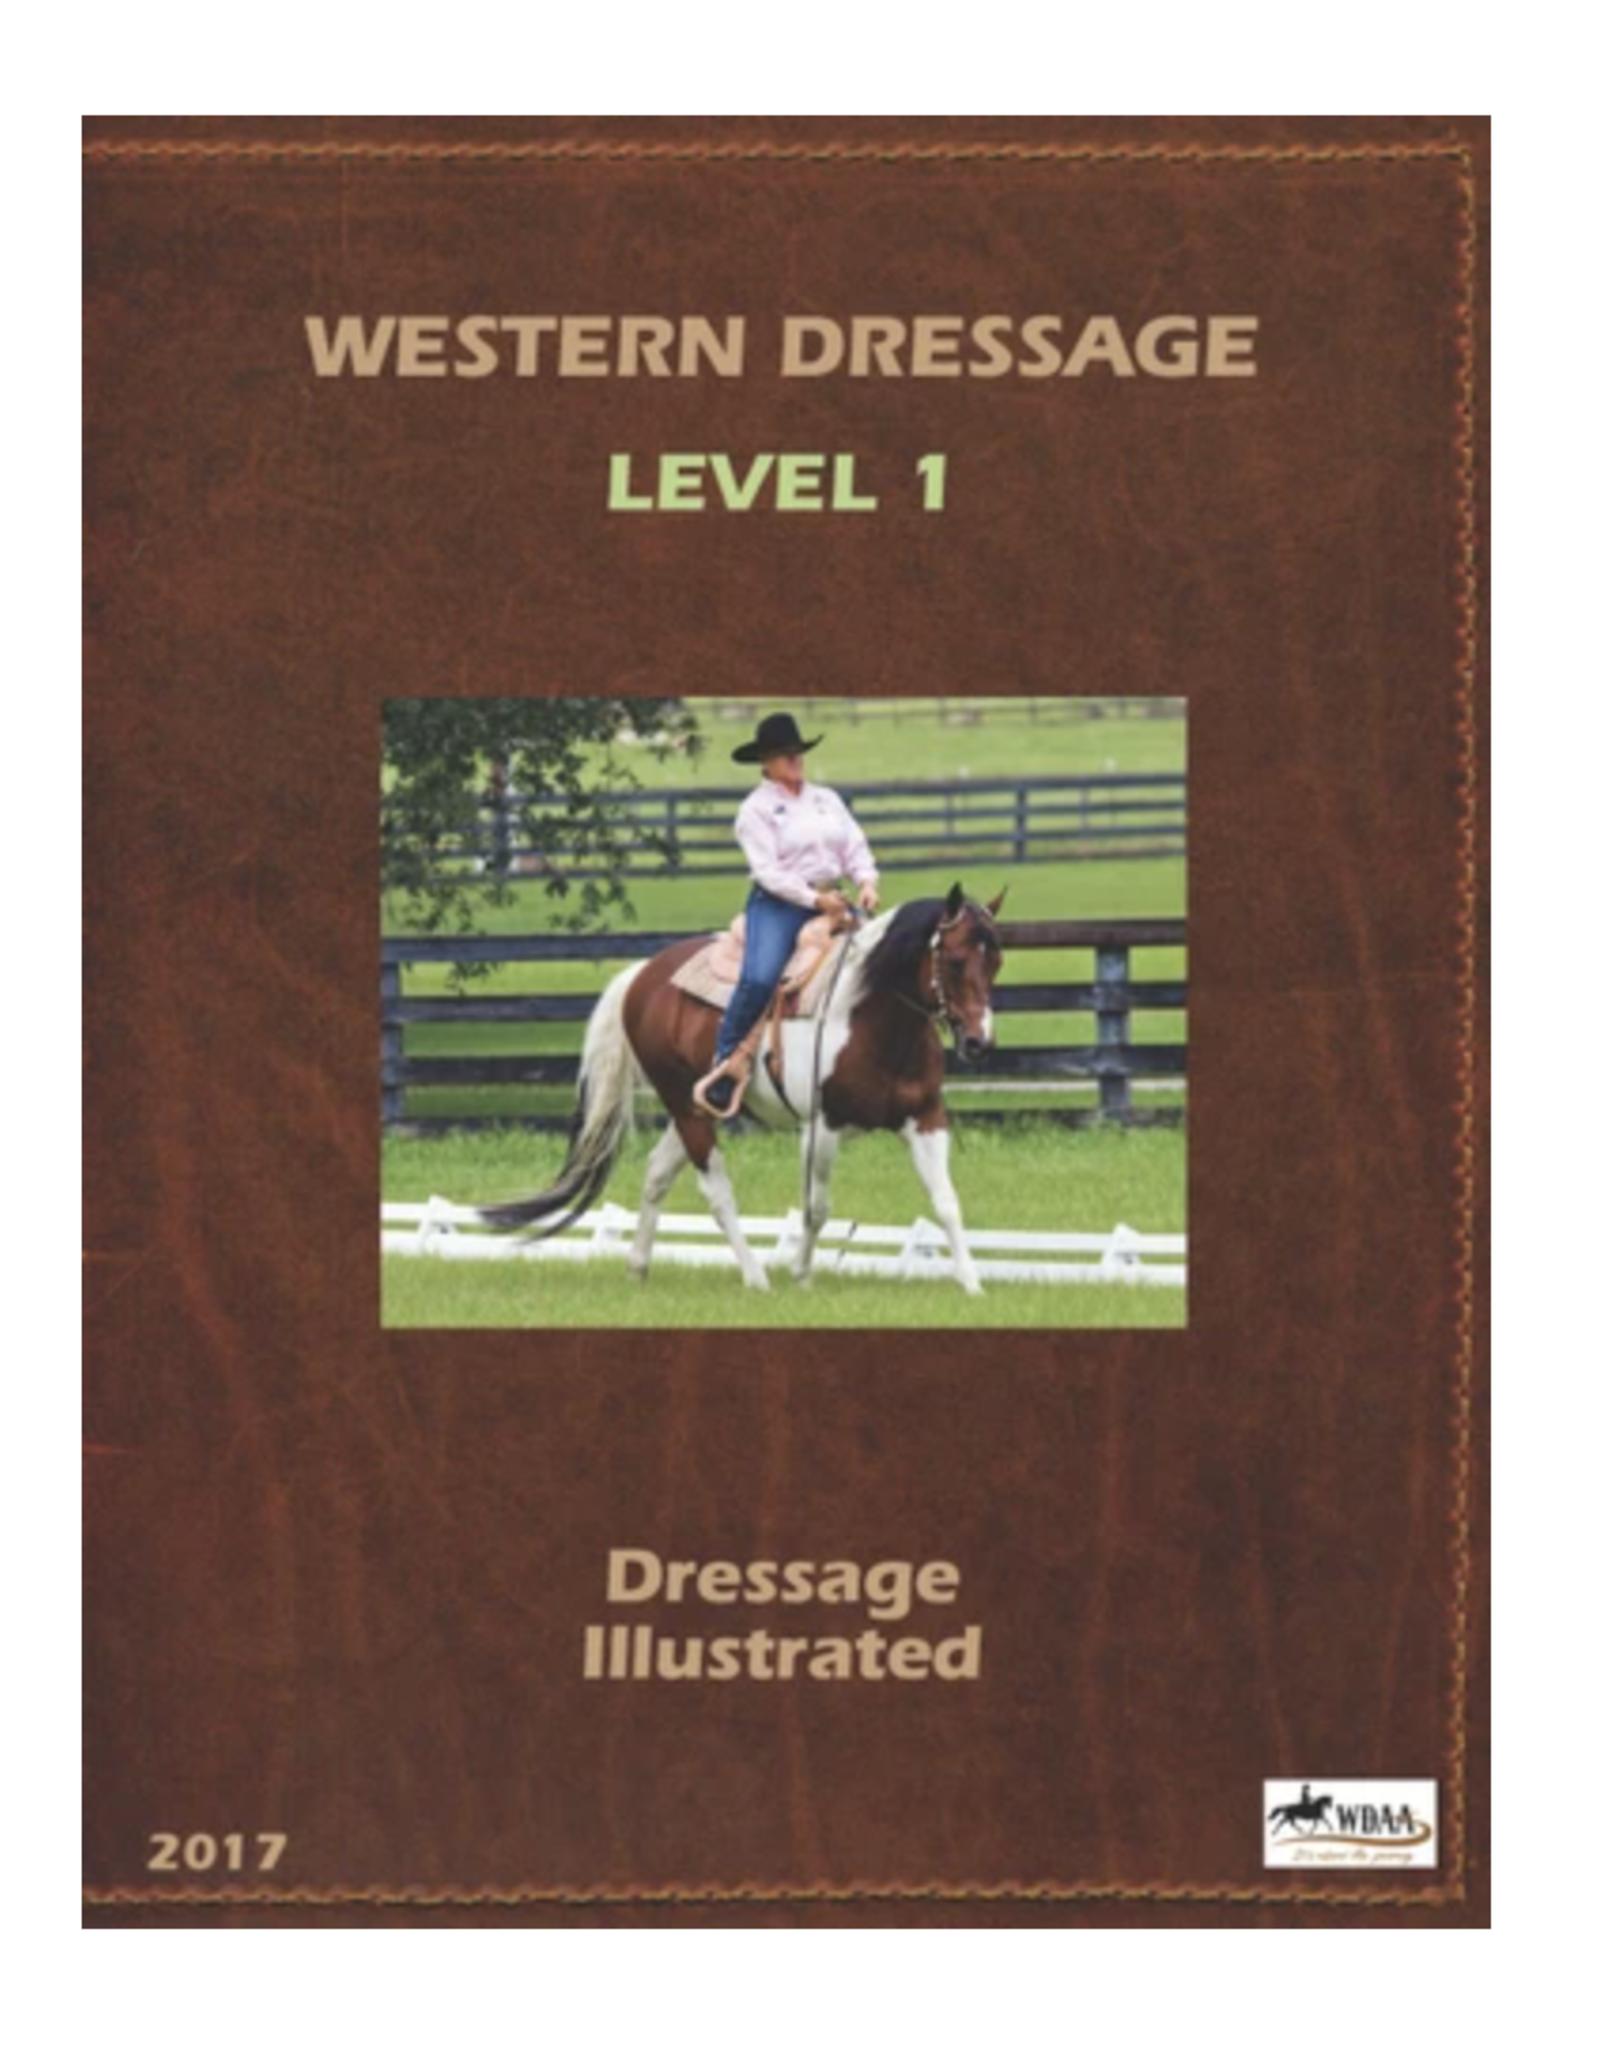 Wdaa Western Dressage Level 1 Calabasas Saddlery